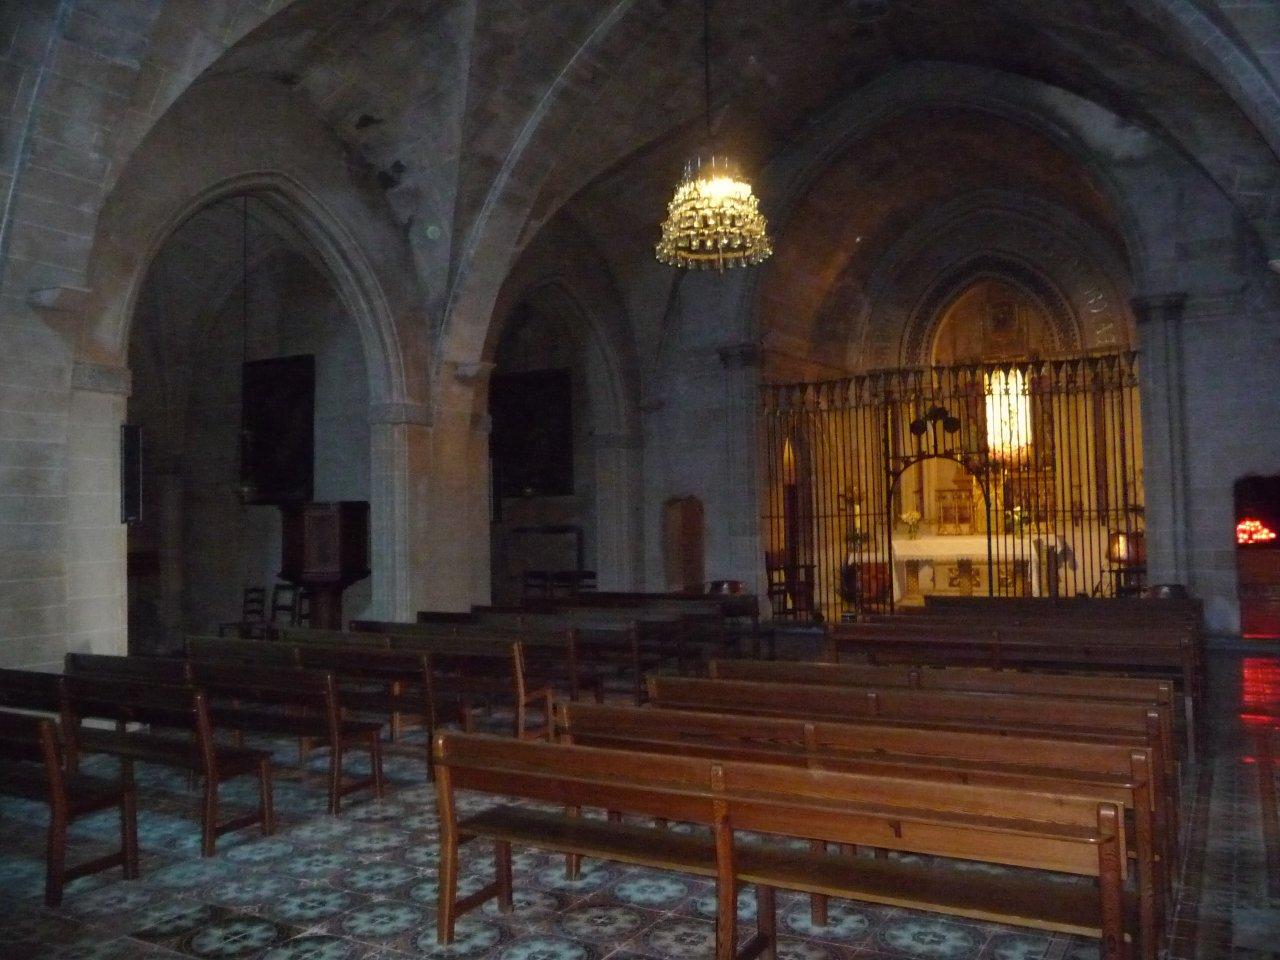 monastry puig maria church internal